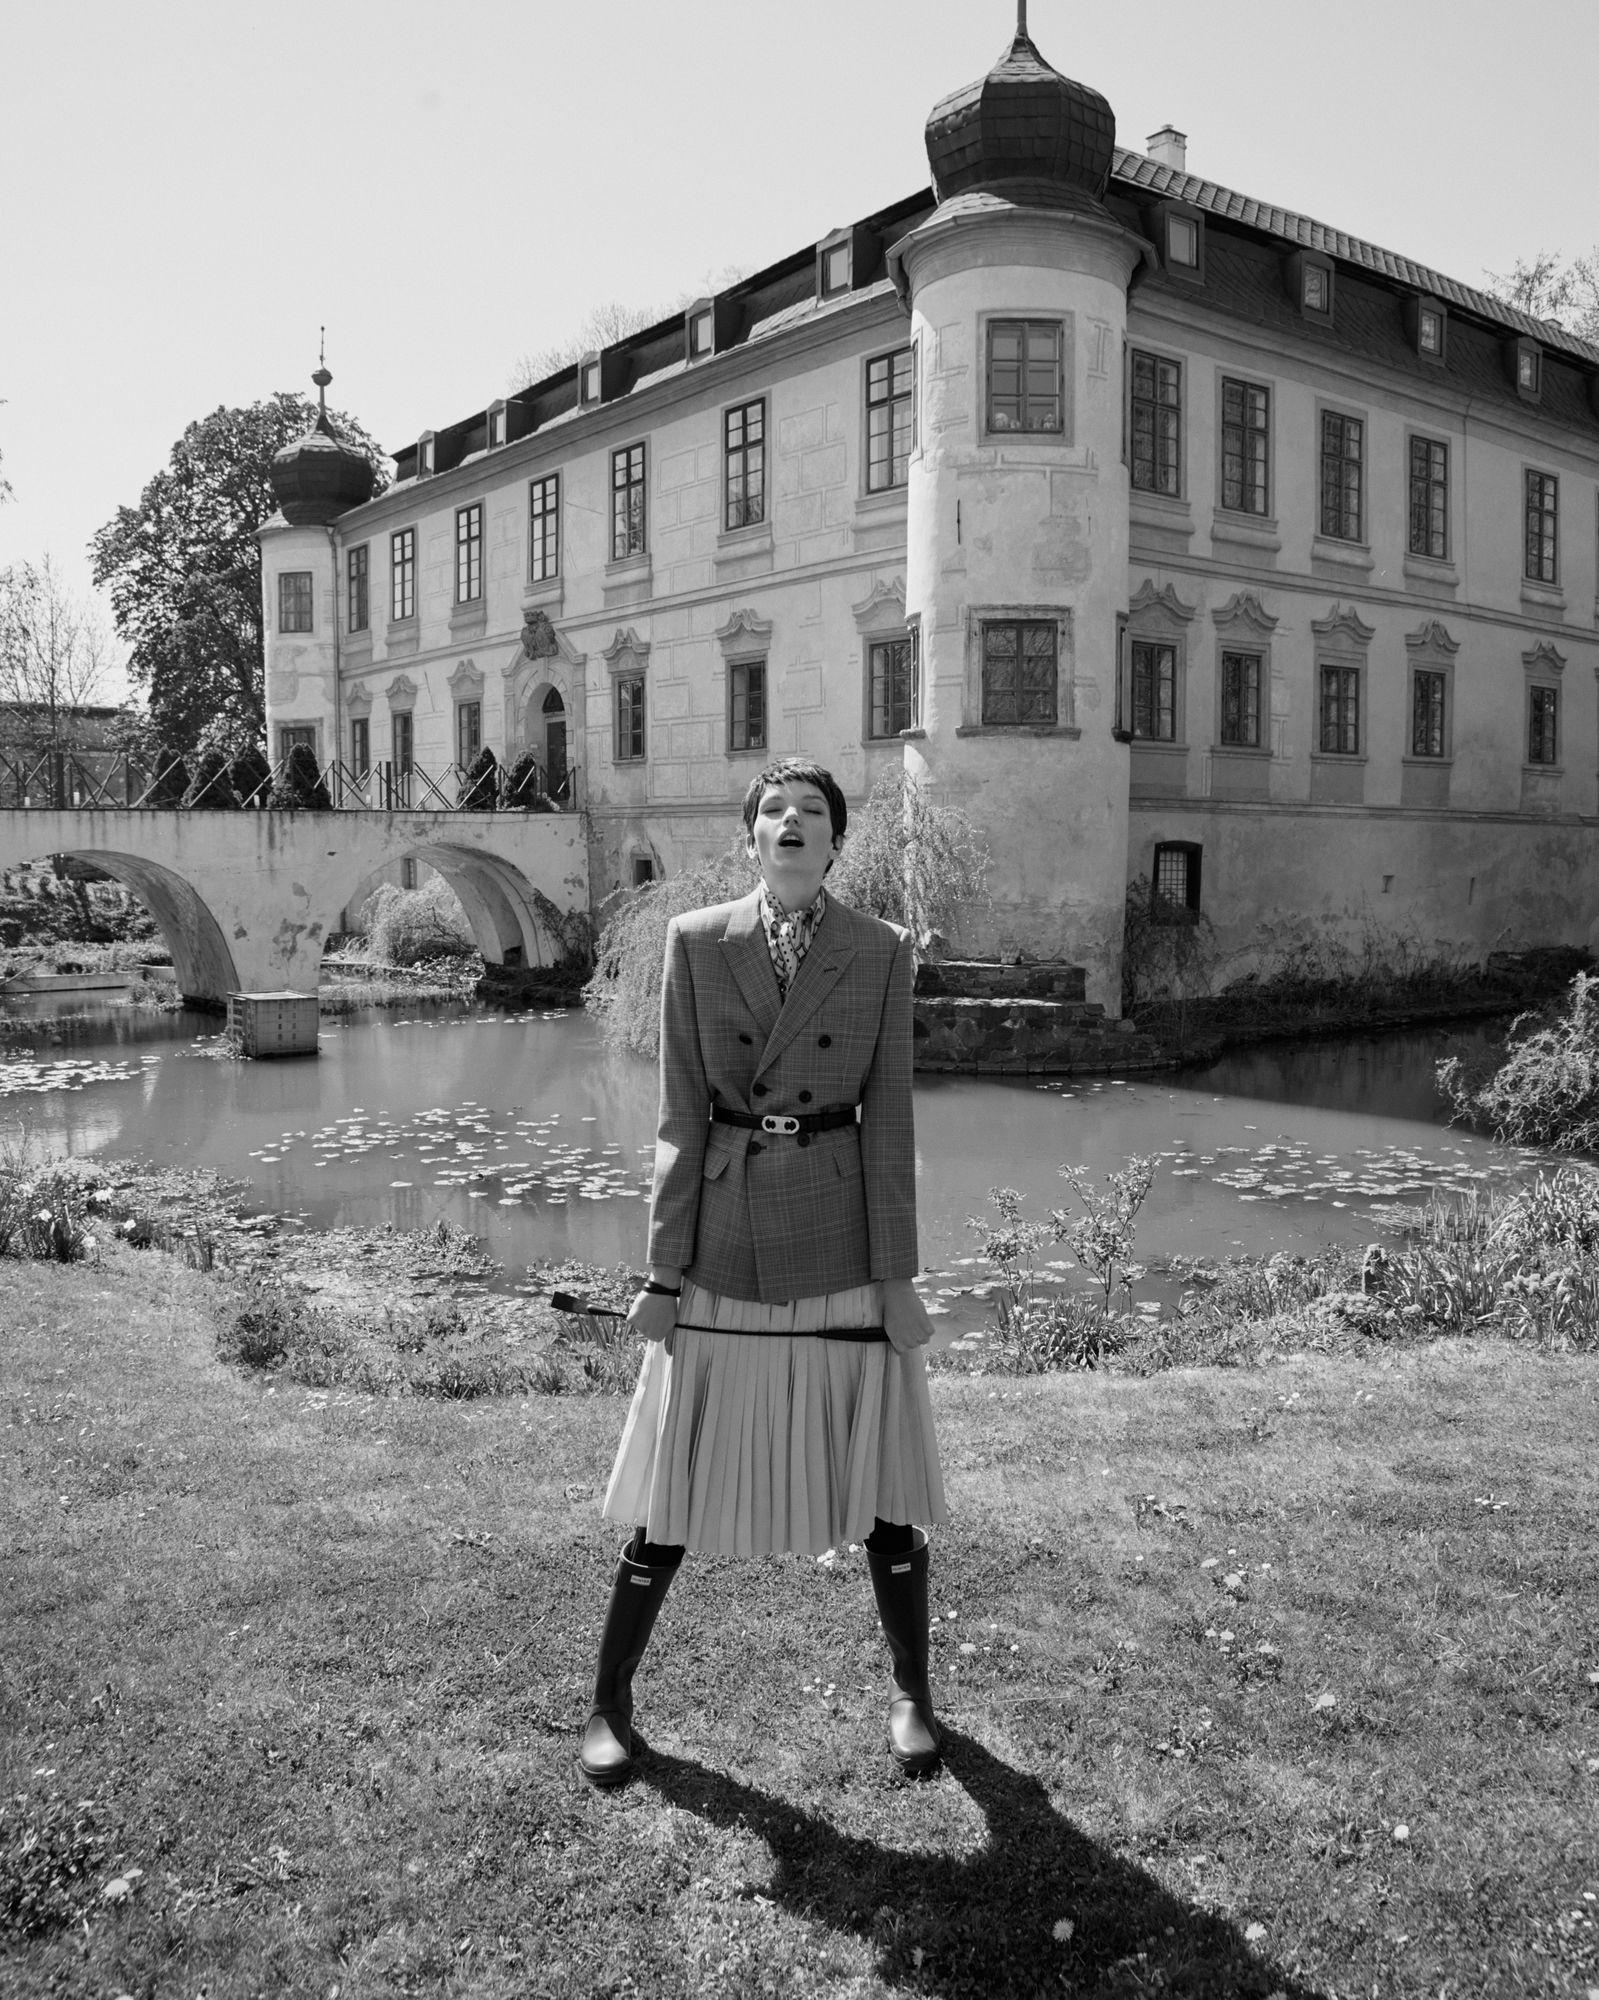 ANDREAS ORTNER: Eva Klimkova for DOLCE VITA Mag June 2020